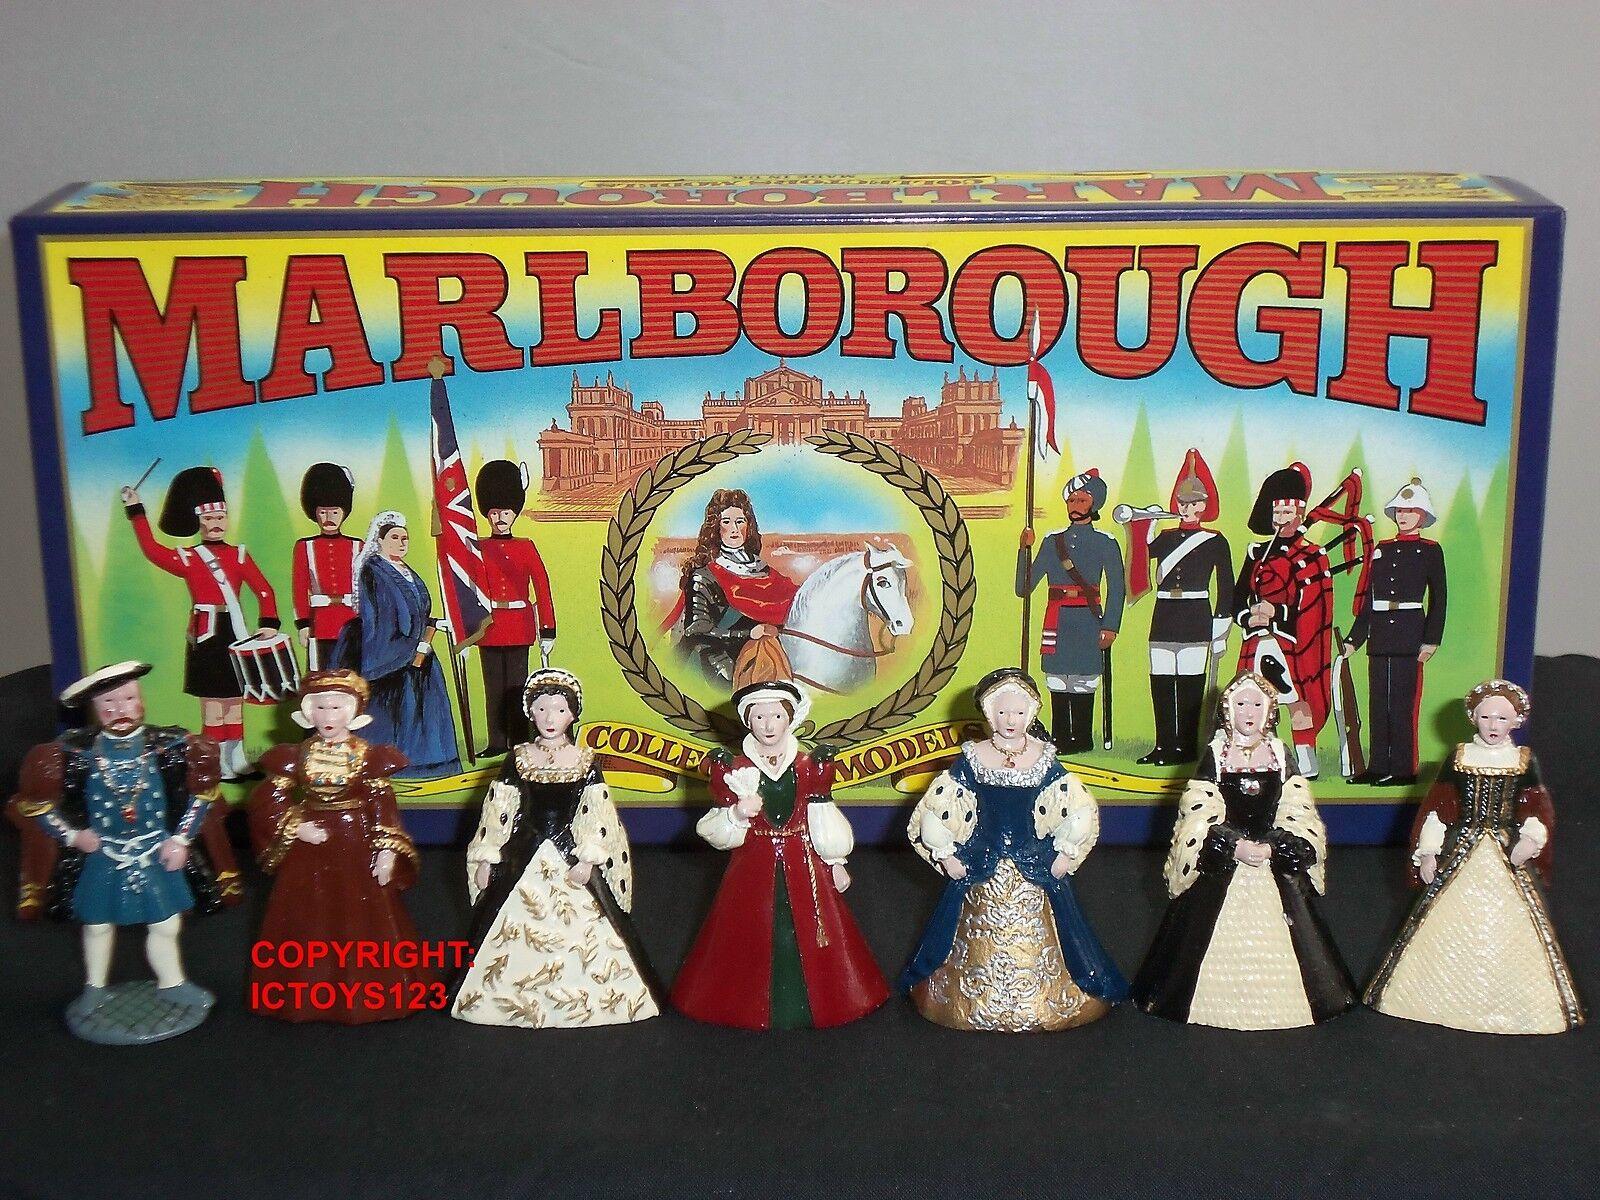 MARLBgoldUGH MODELS KING HENRY VIII + HIS SIX WIVES METAL CIVILIAN FIGURE SET